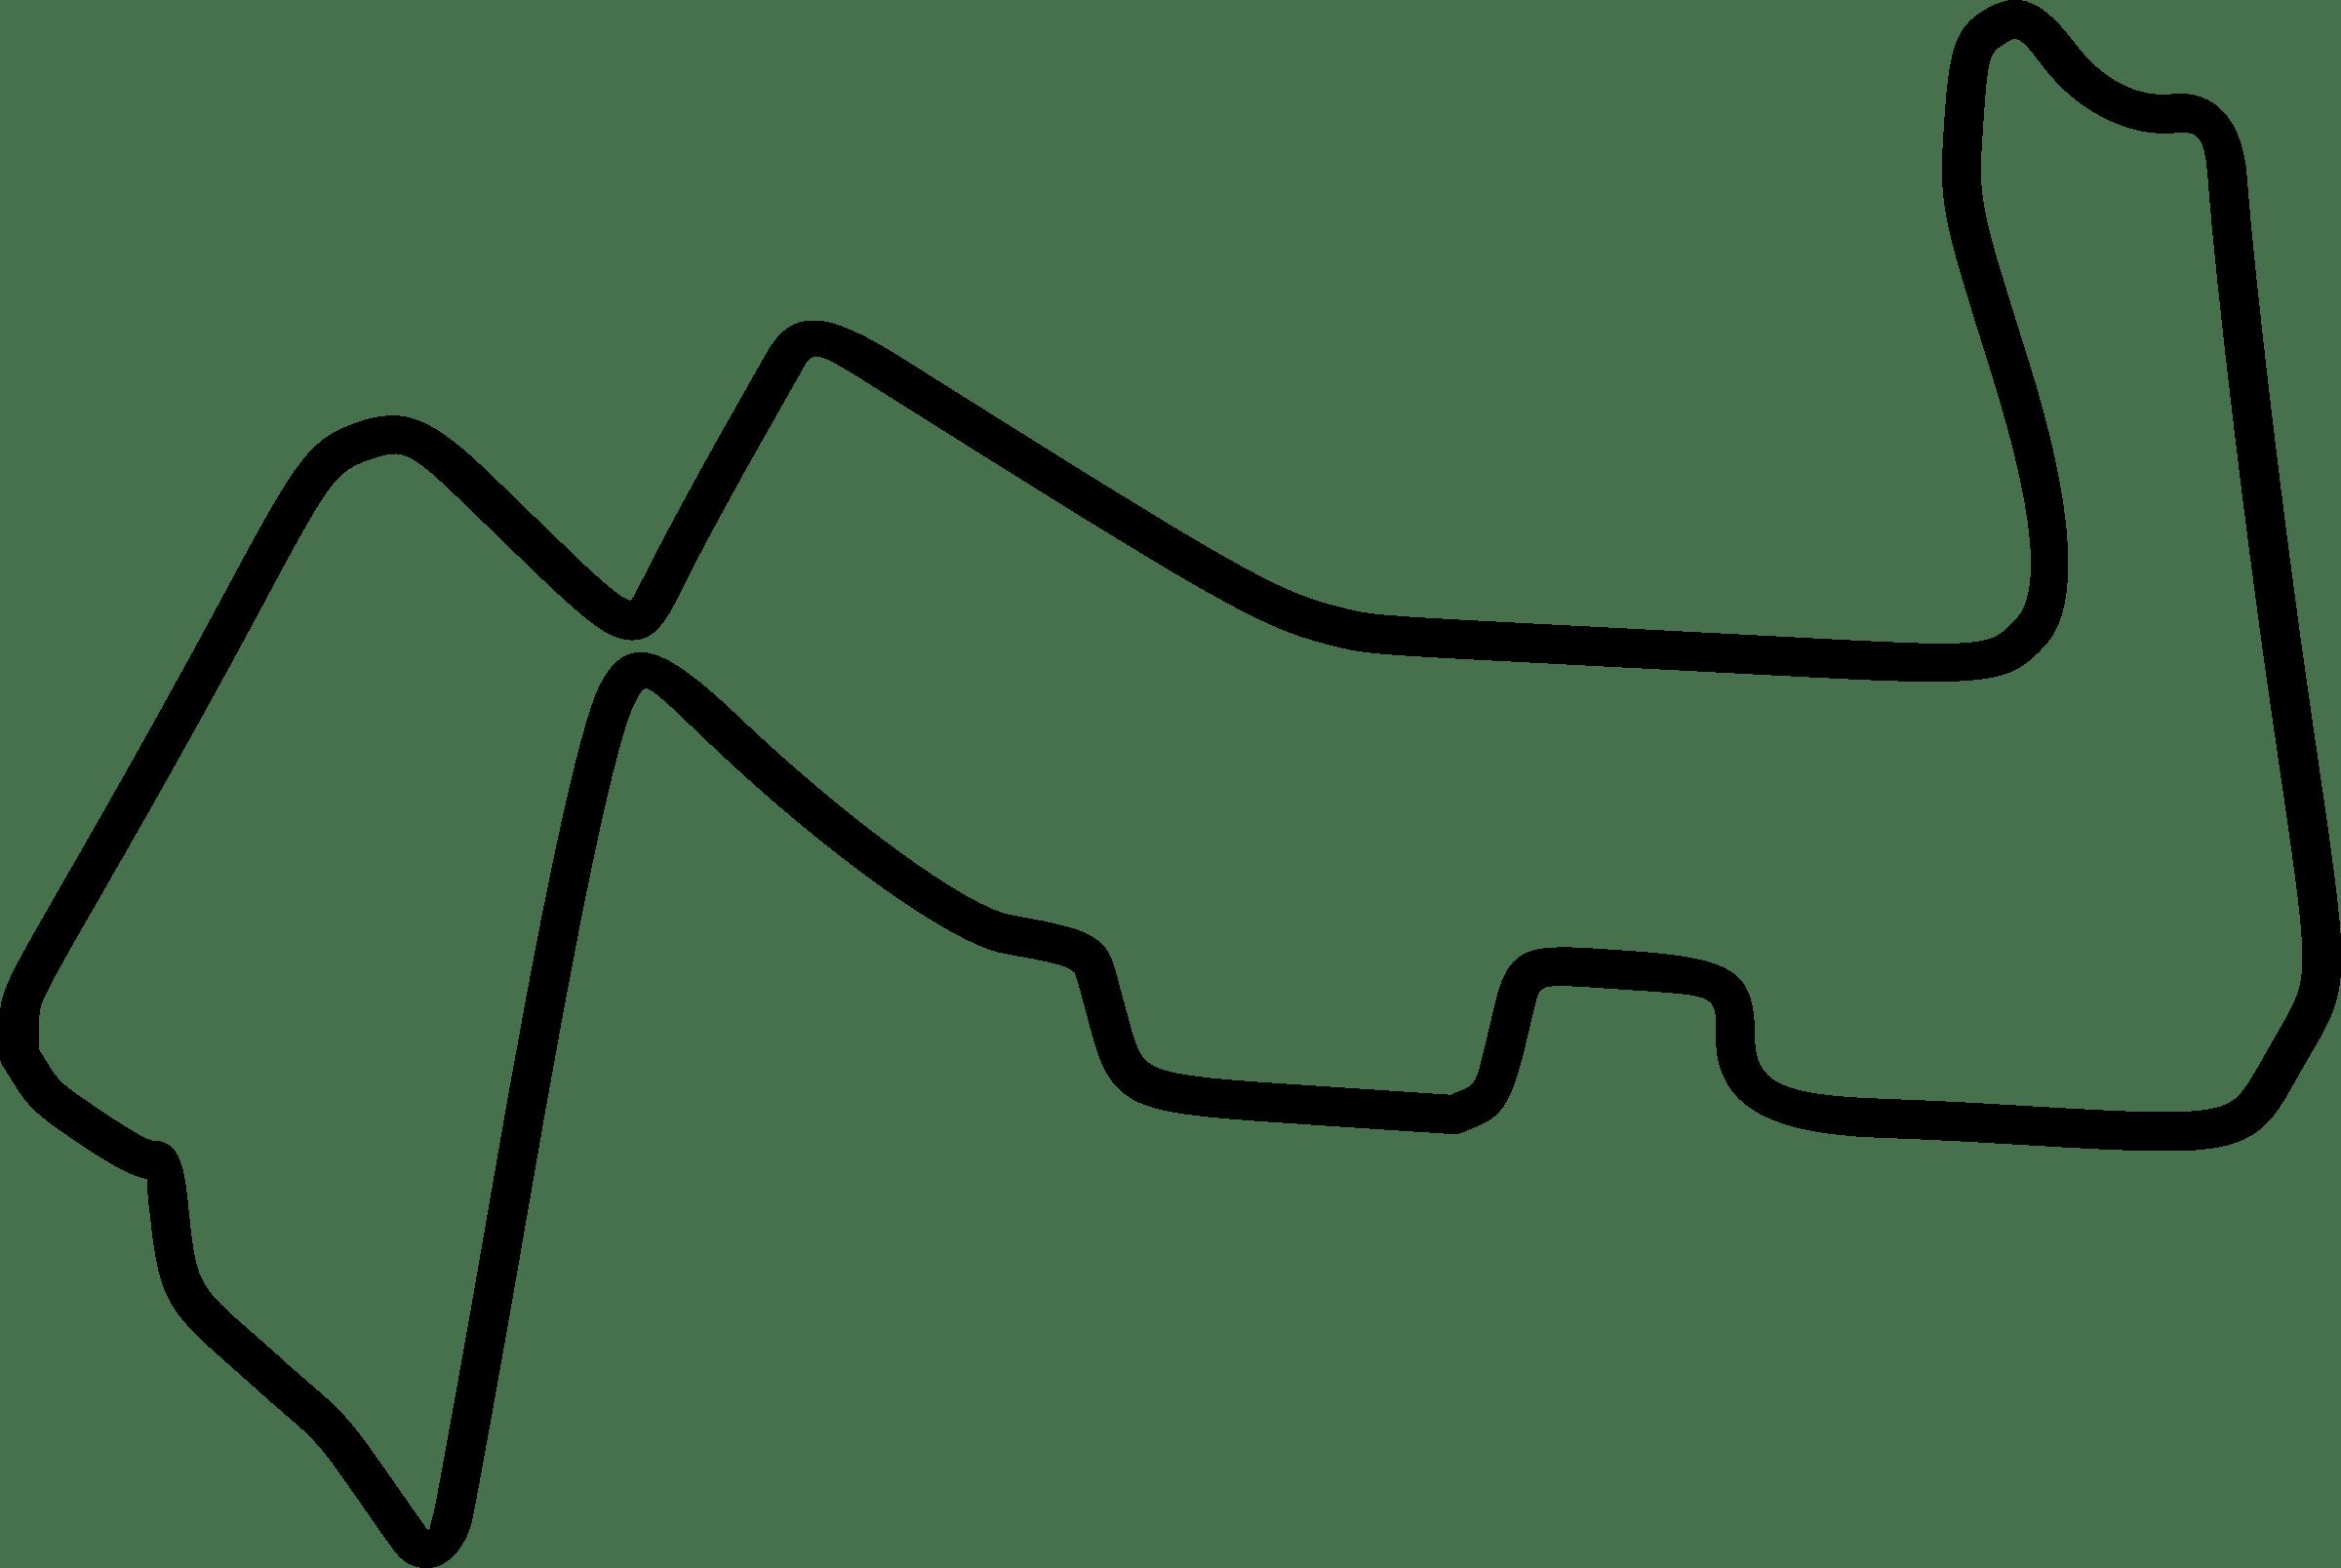 Track Clipart Outline Track Outline Transparent Free For